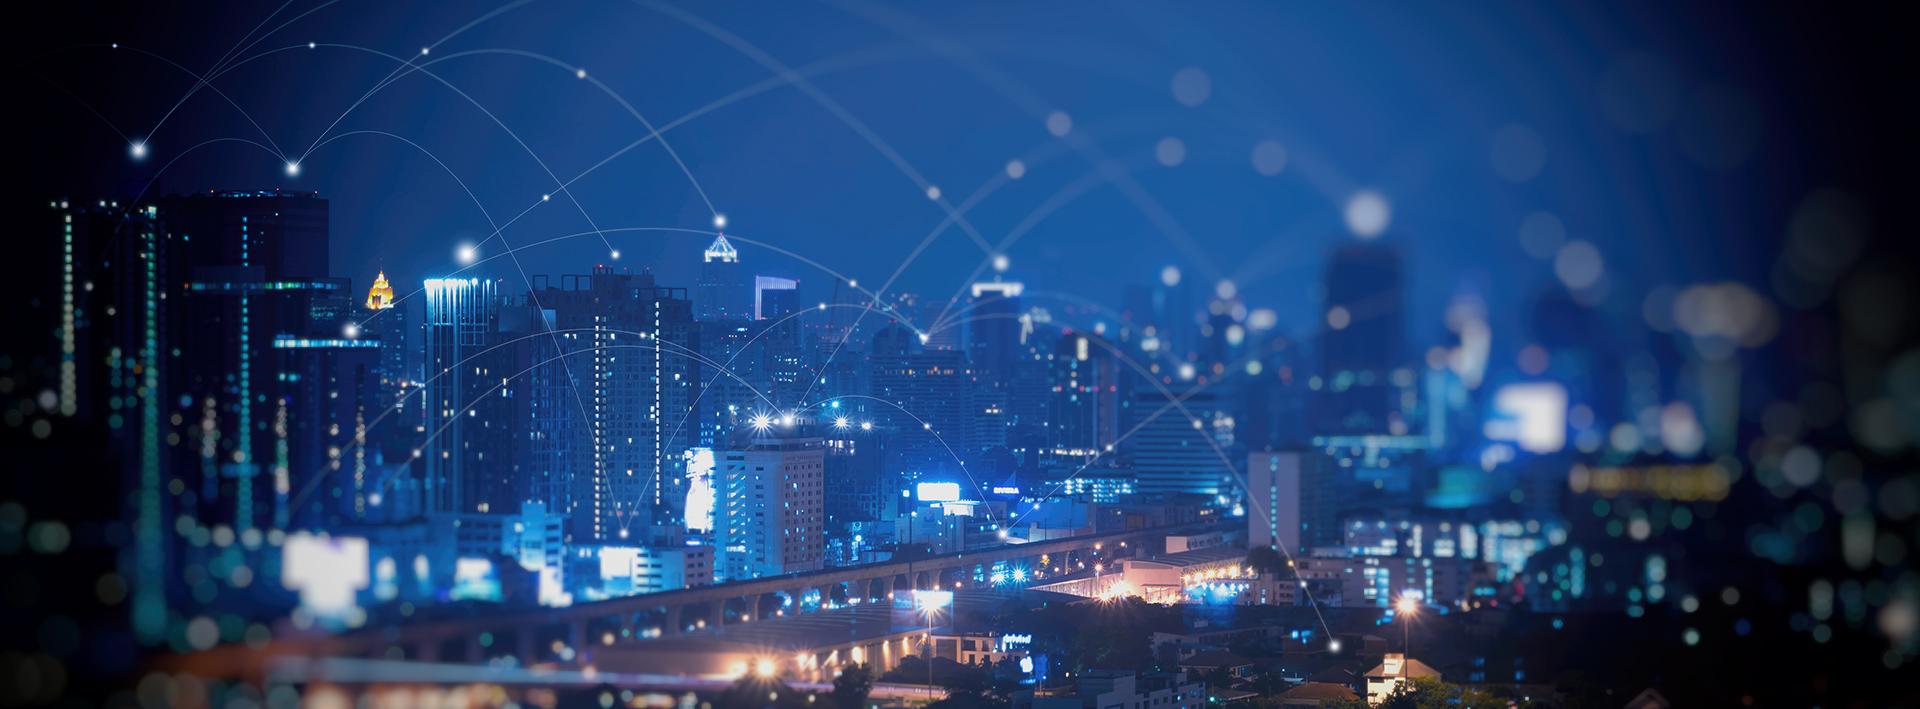 Cost-Effective Wi-Fi IoT SoC